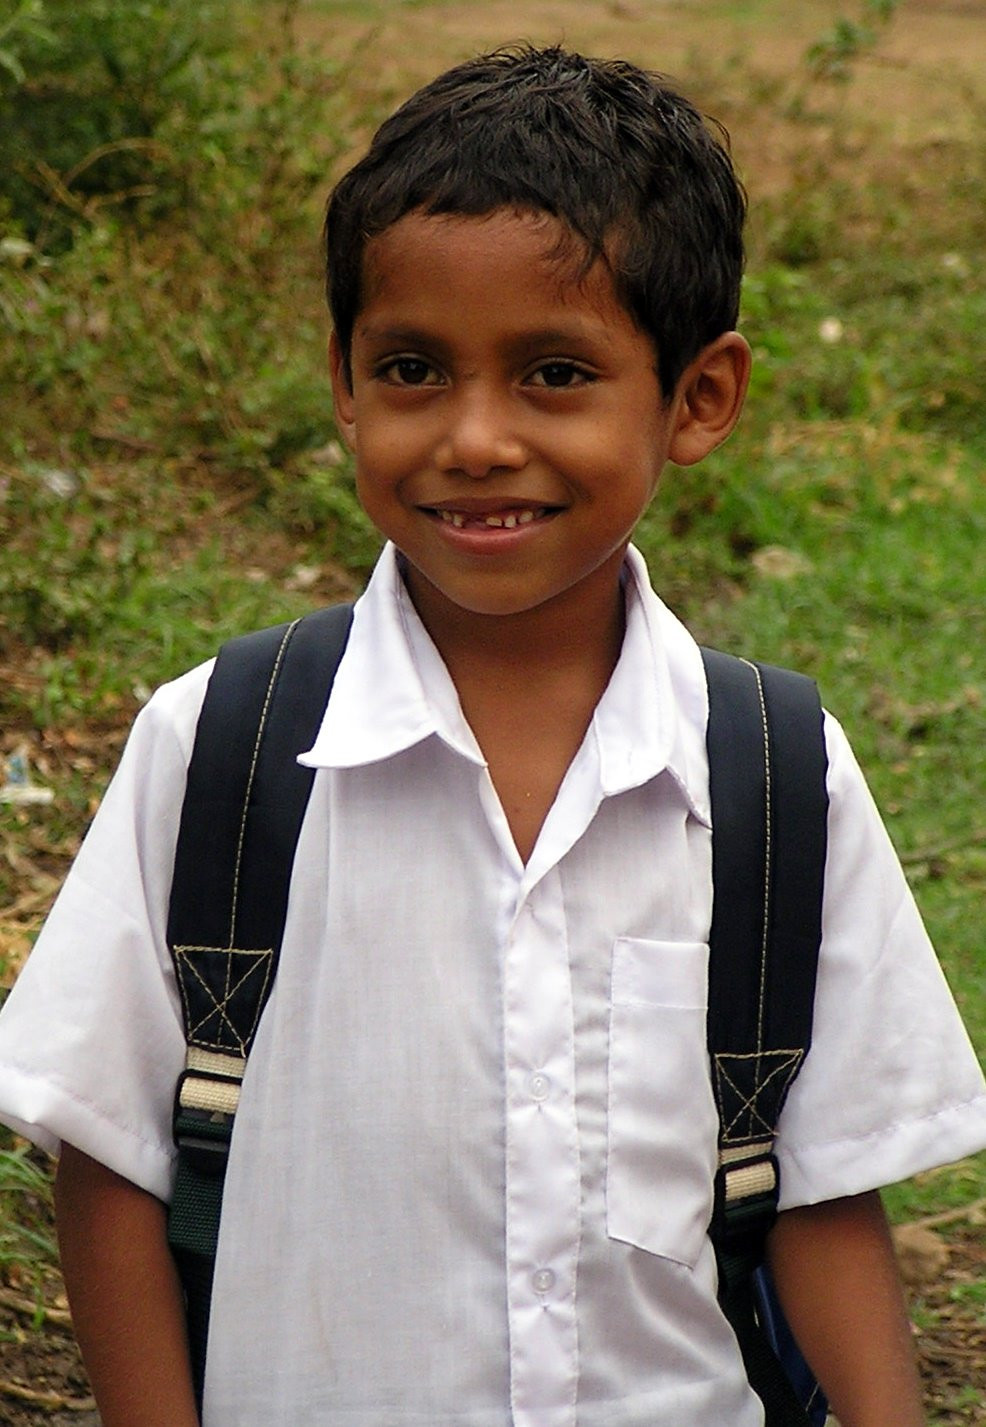 Jose Armando, 6 Years Old